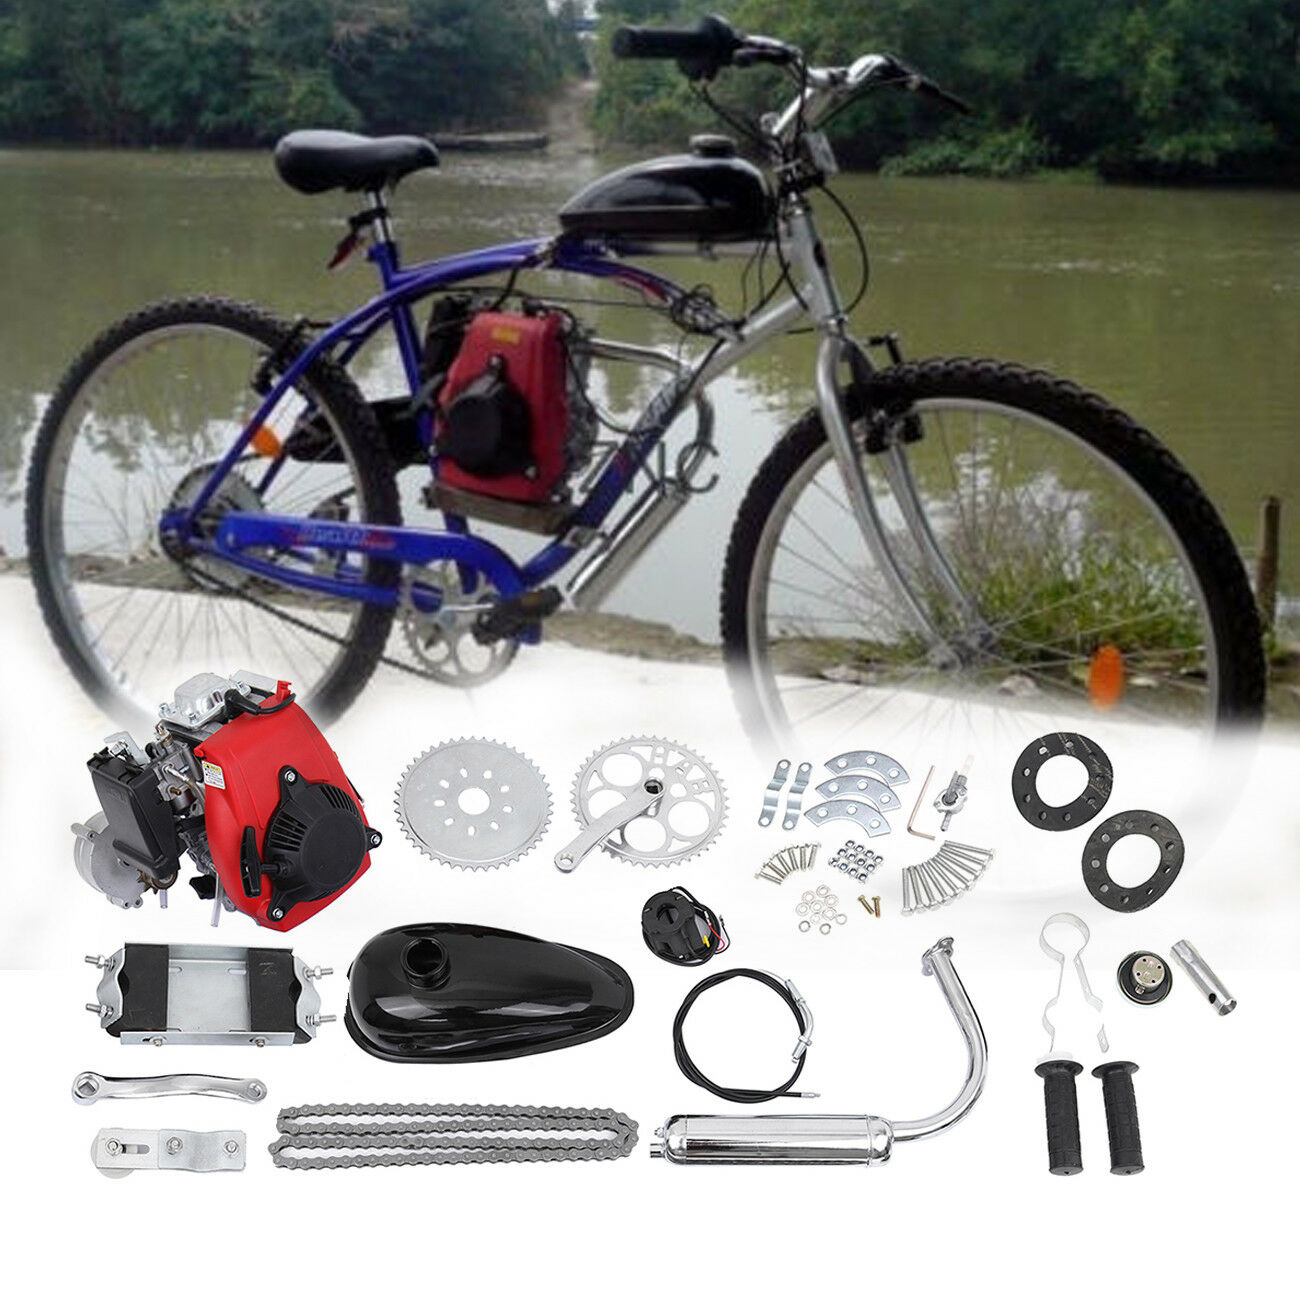 4-Takt 49CC Gas Benzin Motorierte Bike142F 26